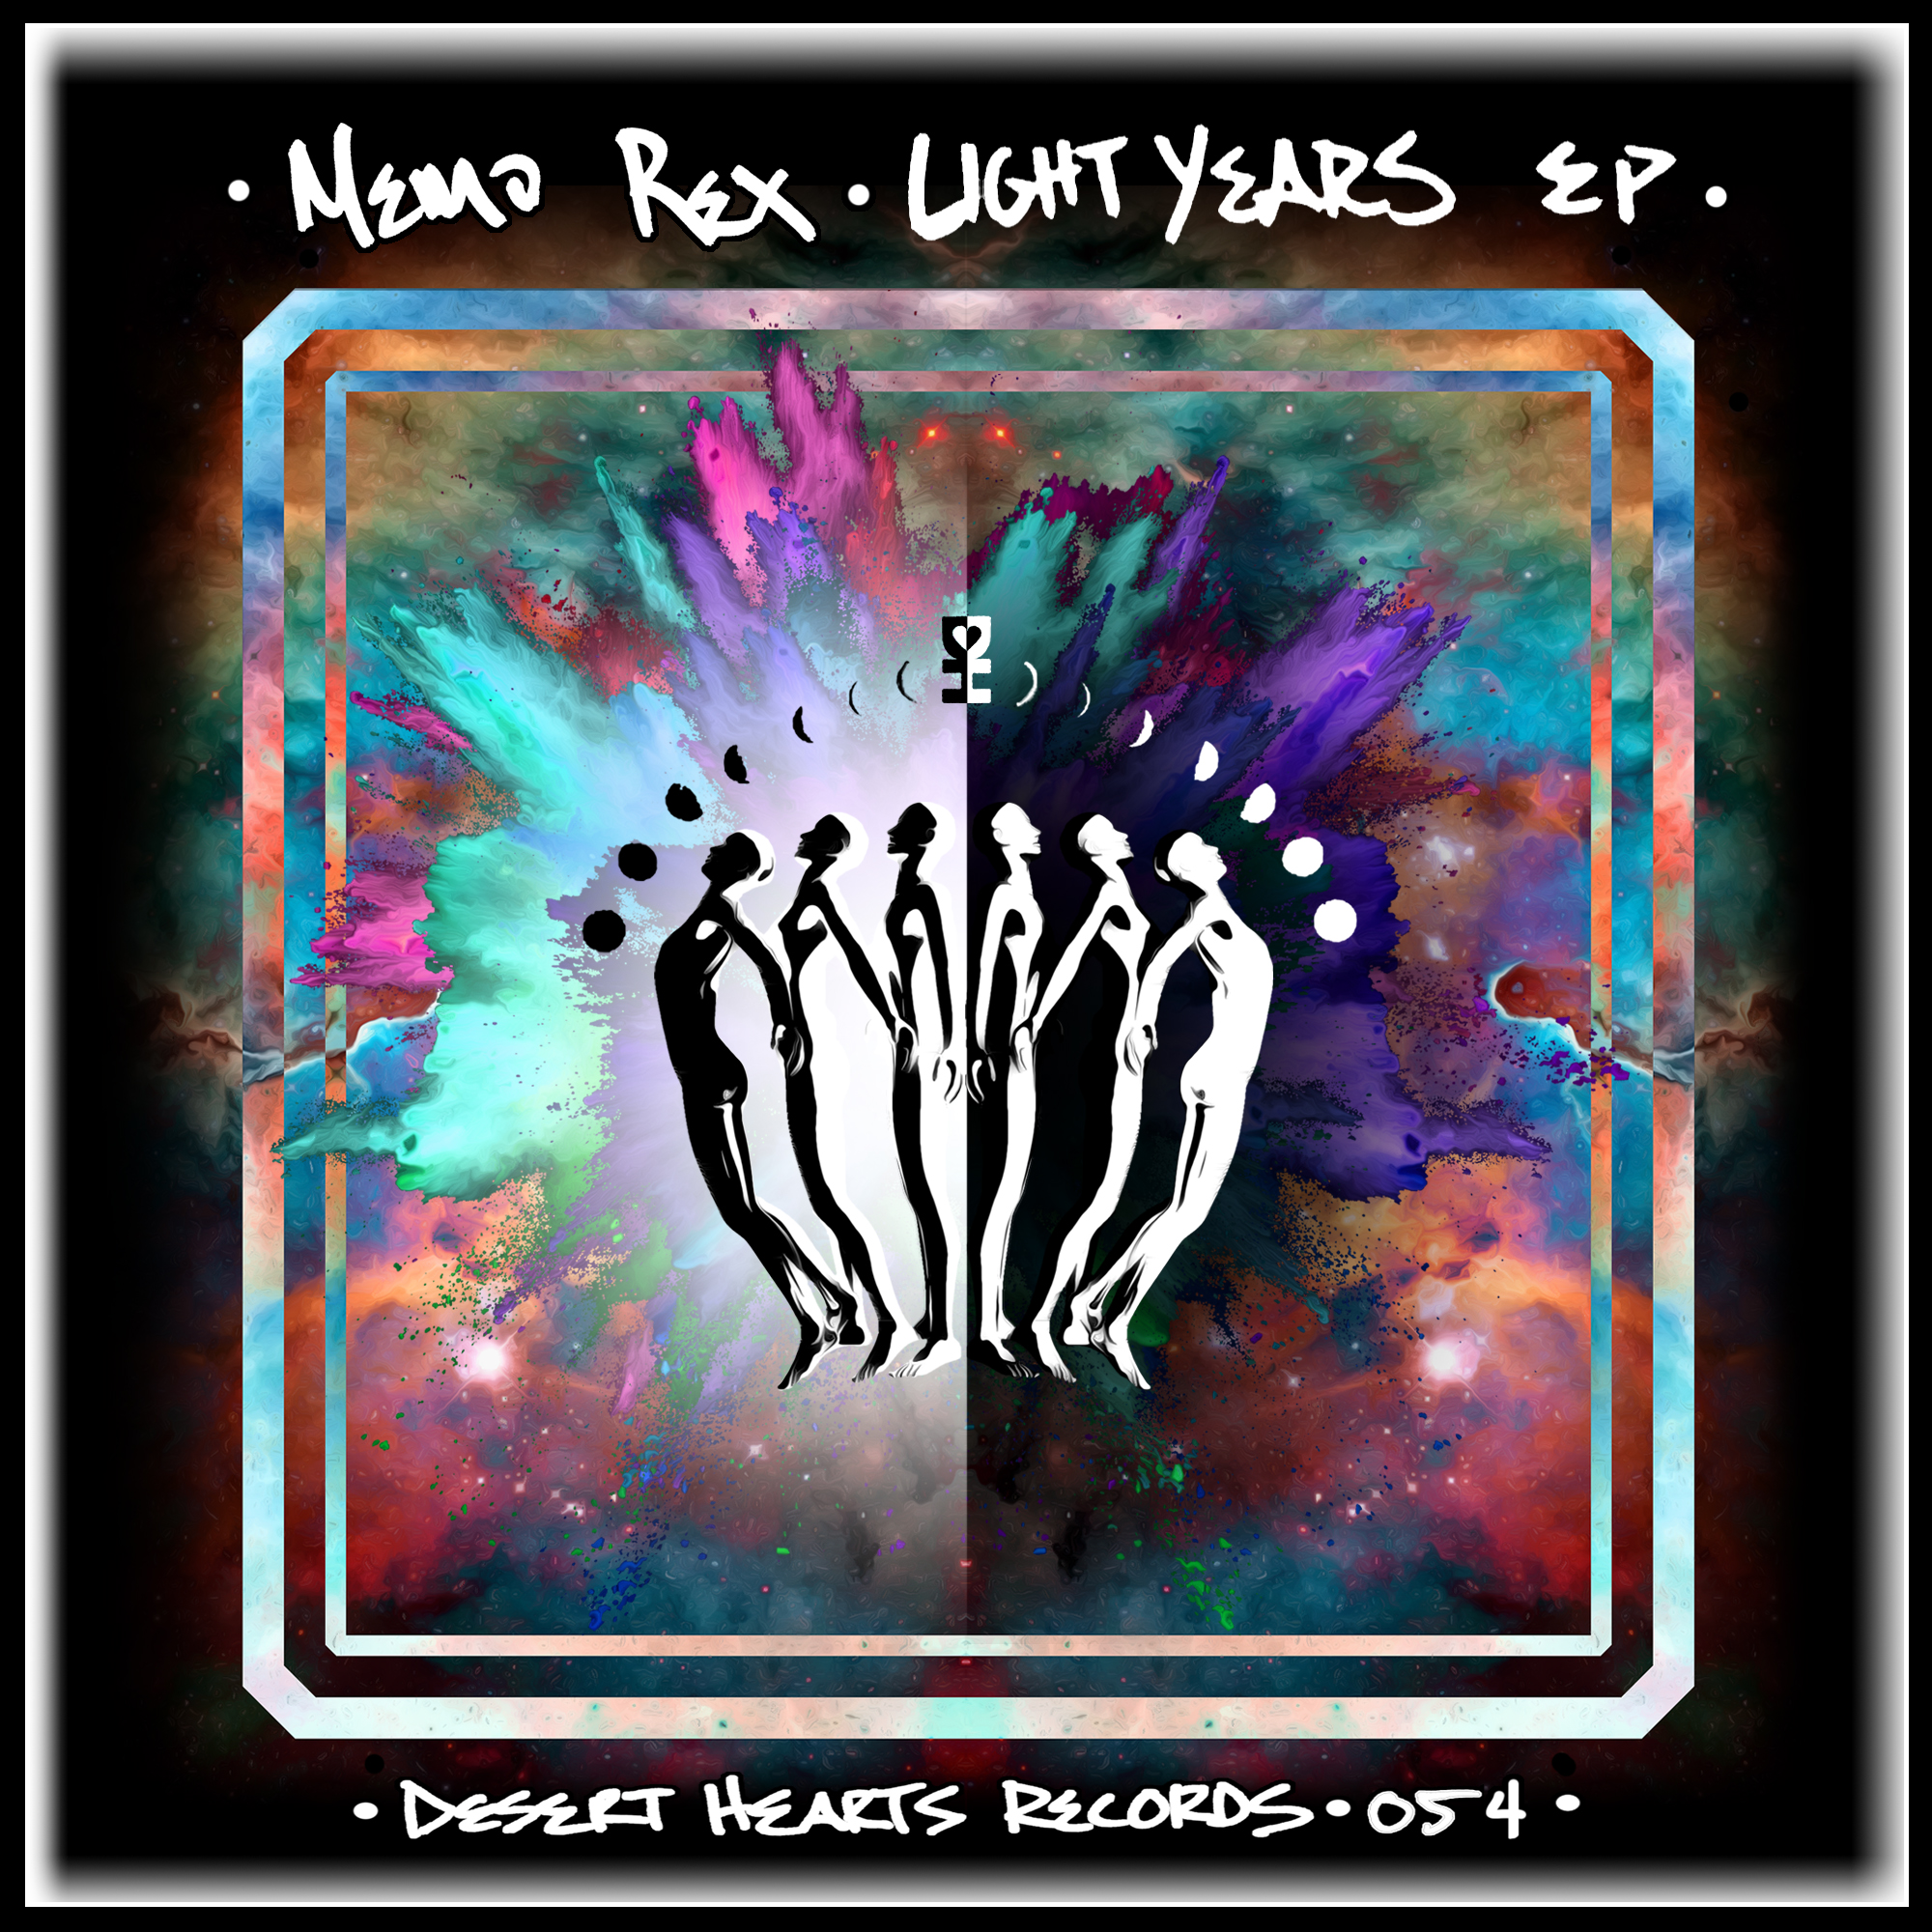 LightYears EP [square].jpg